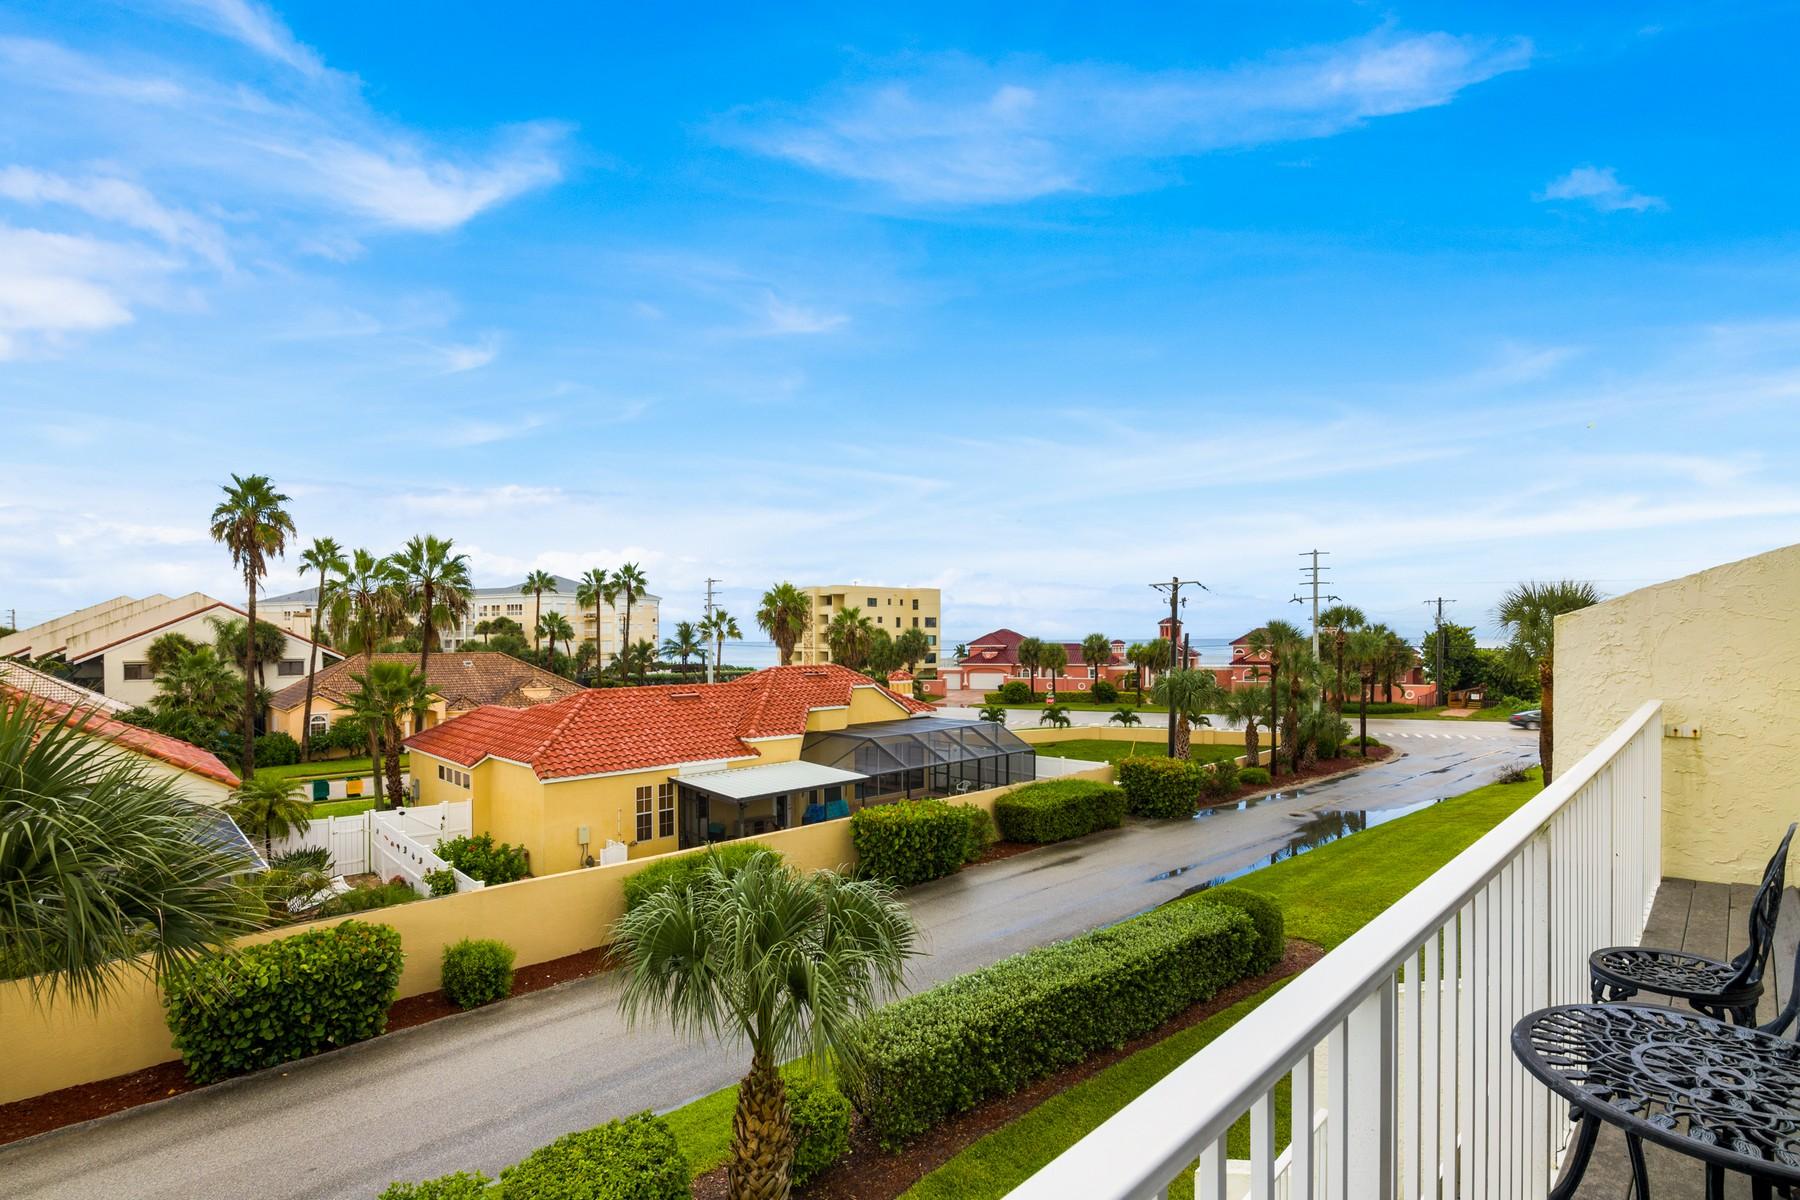 Coastal Abode with Warm Hues & Beachy Theme 101 La Costa Street Unit 5 Melbourne Beach, Florida 32951 Hoa Kỳ